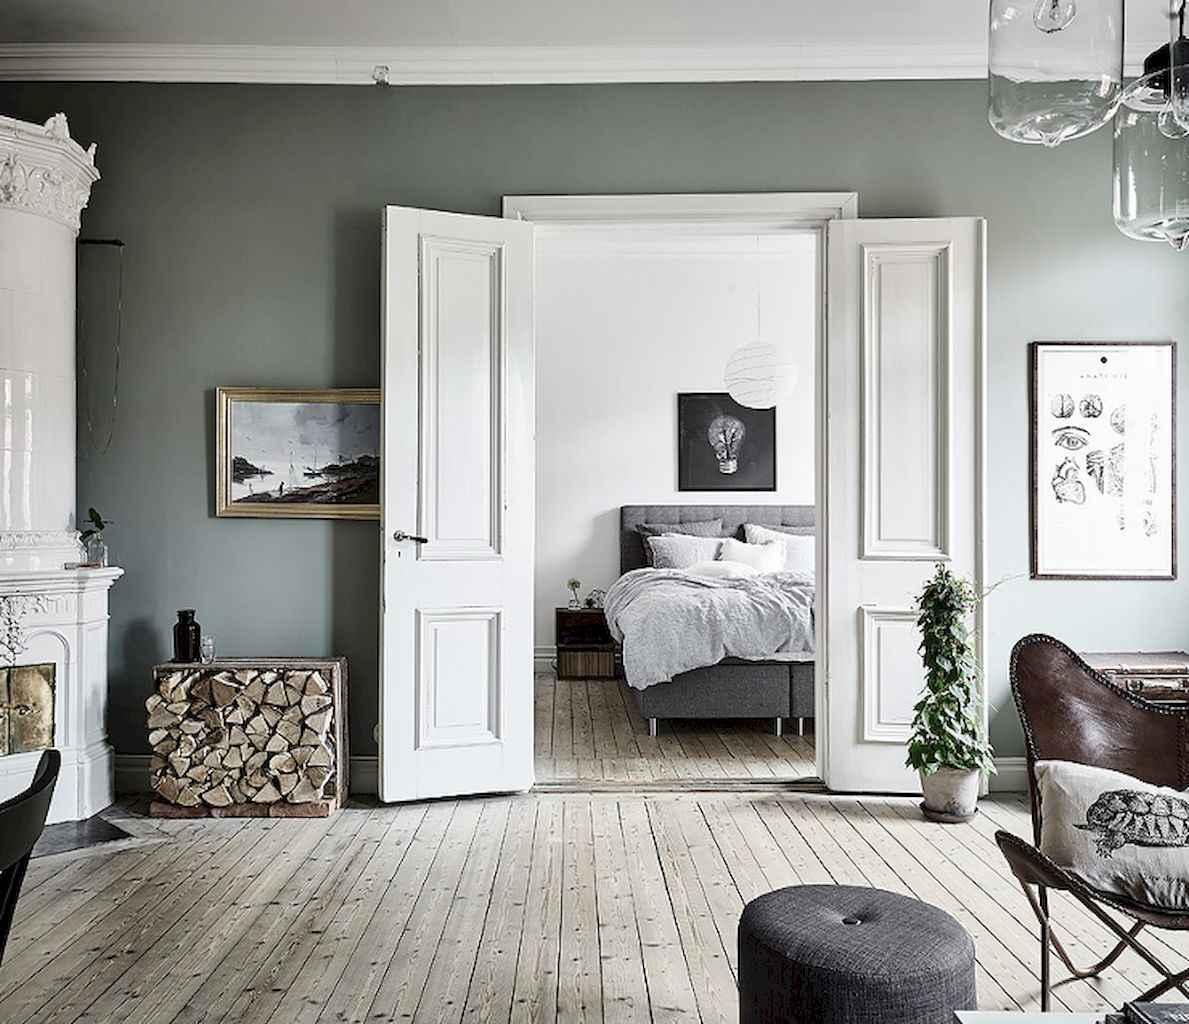 Stylish scandinavian style apartment decor ideas (58)